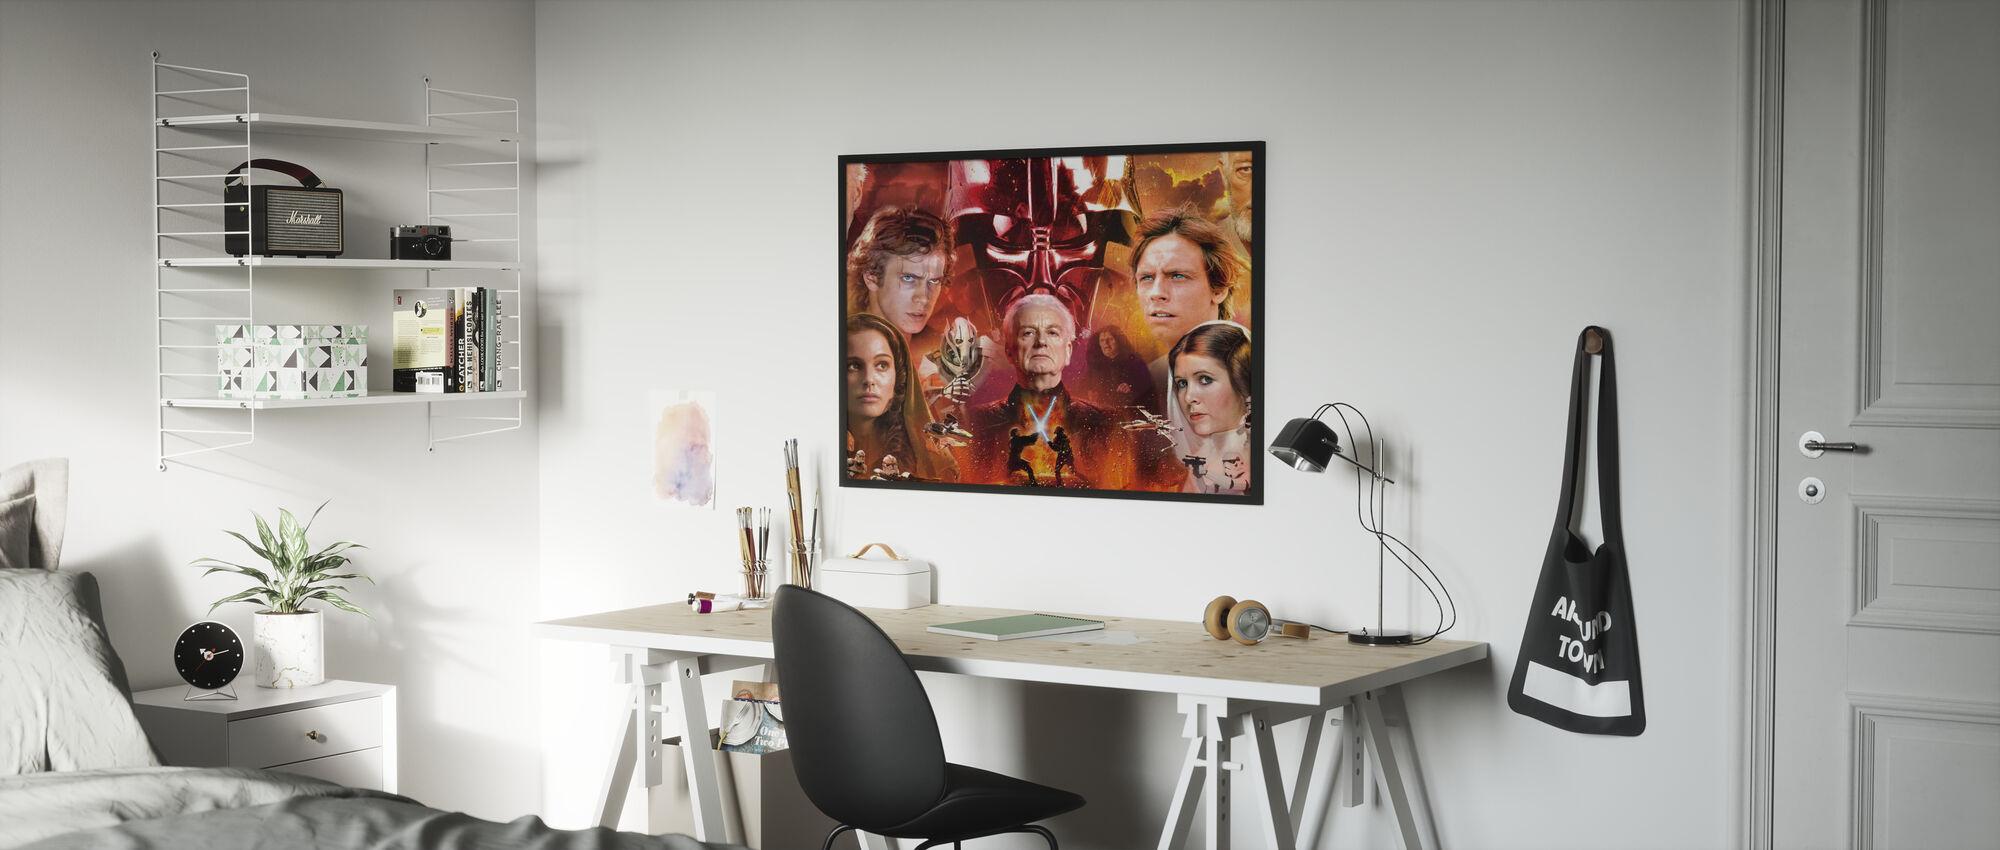 Star Wars - Collage - Innrammet bilde - Barnerom